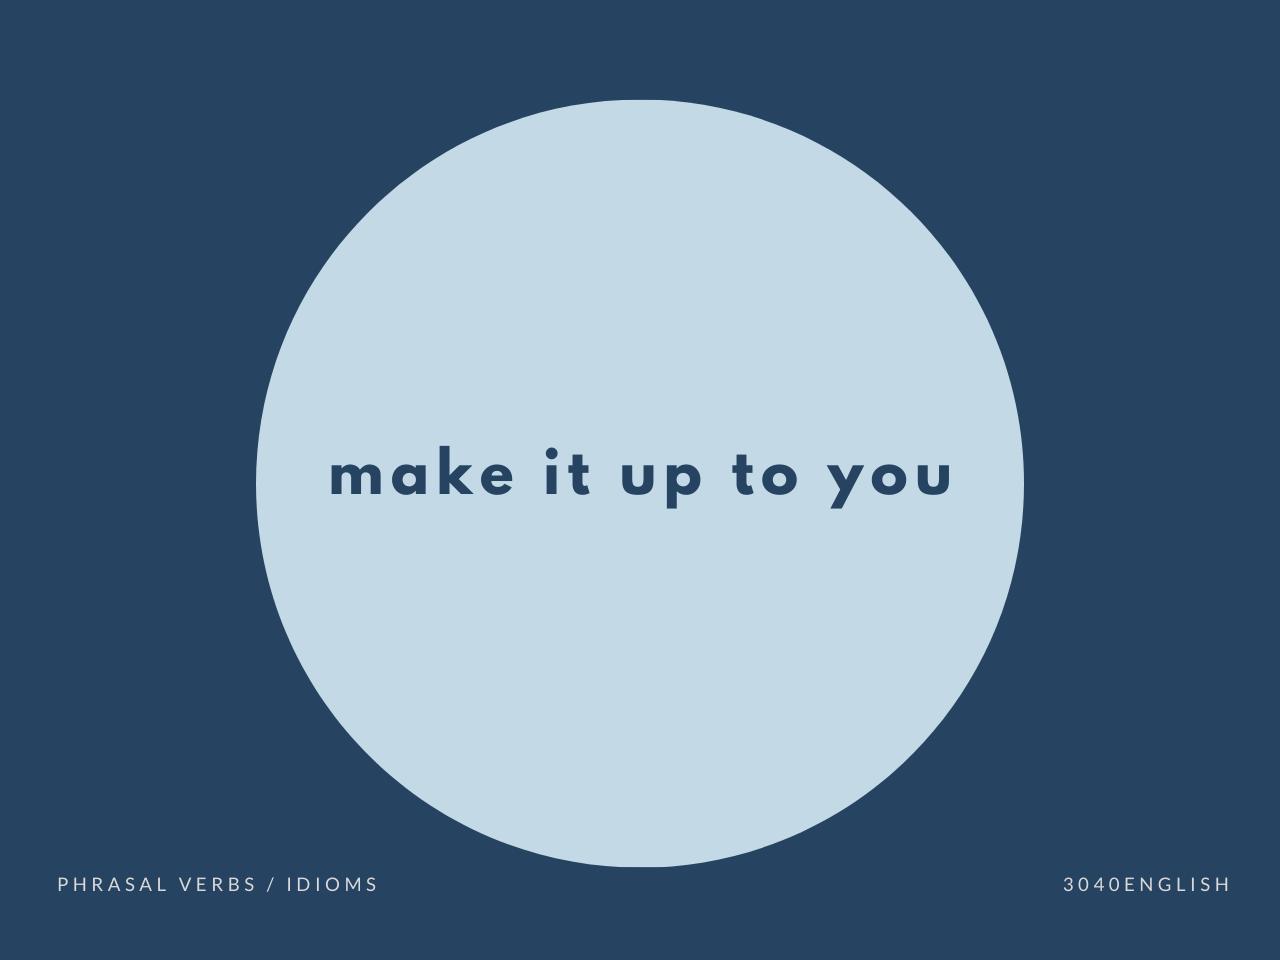 make it up to you の意味と簡単な使い方【例文あり】